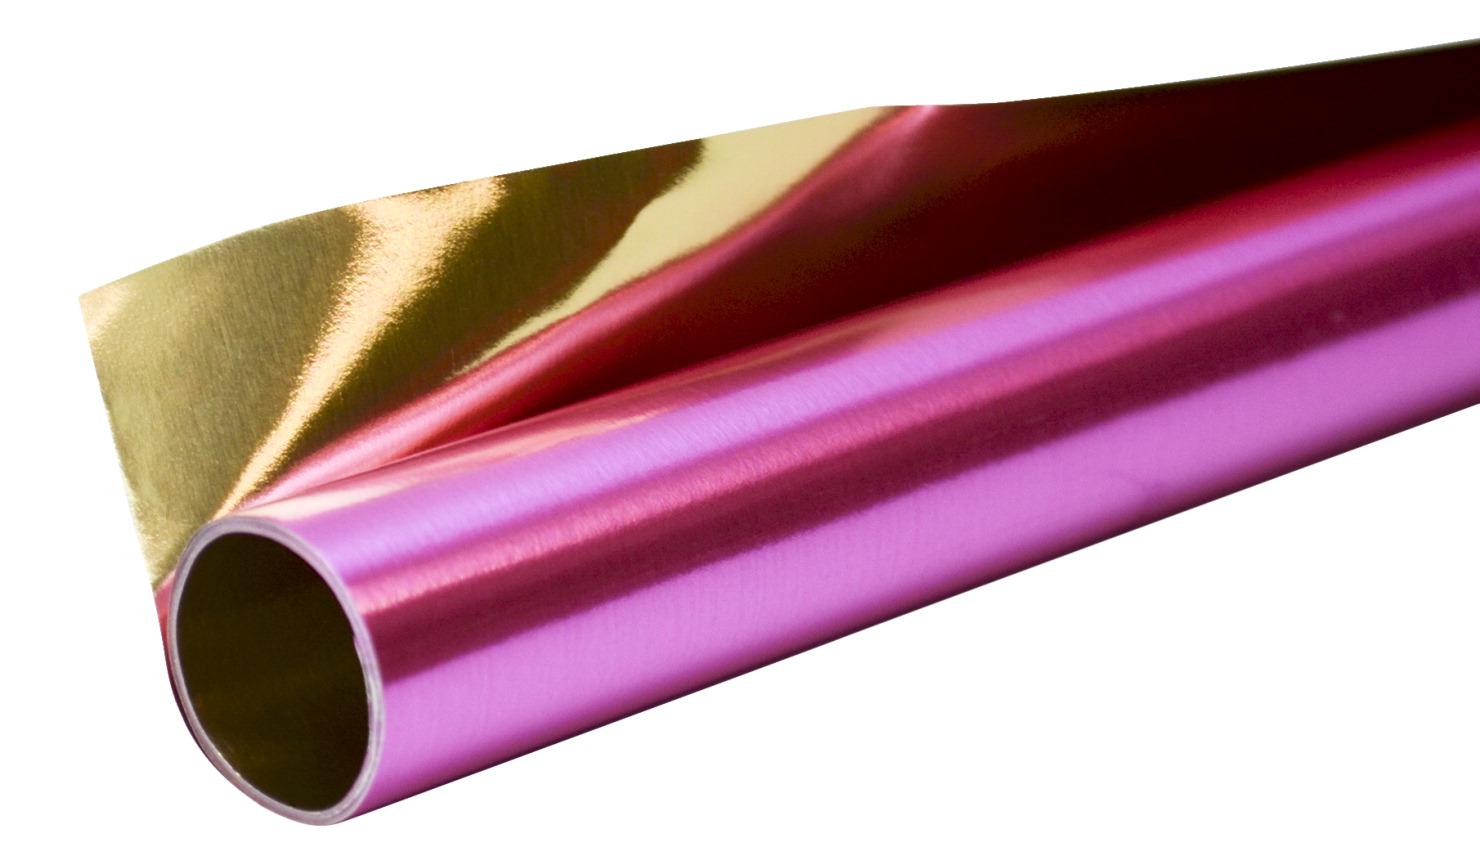 Folia Aluminum Foil Rolls, 19-1/2 x 31 Inches, Rose/Gold